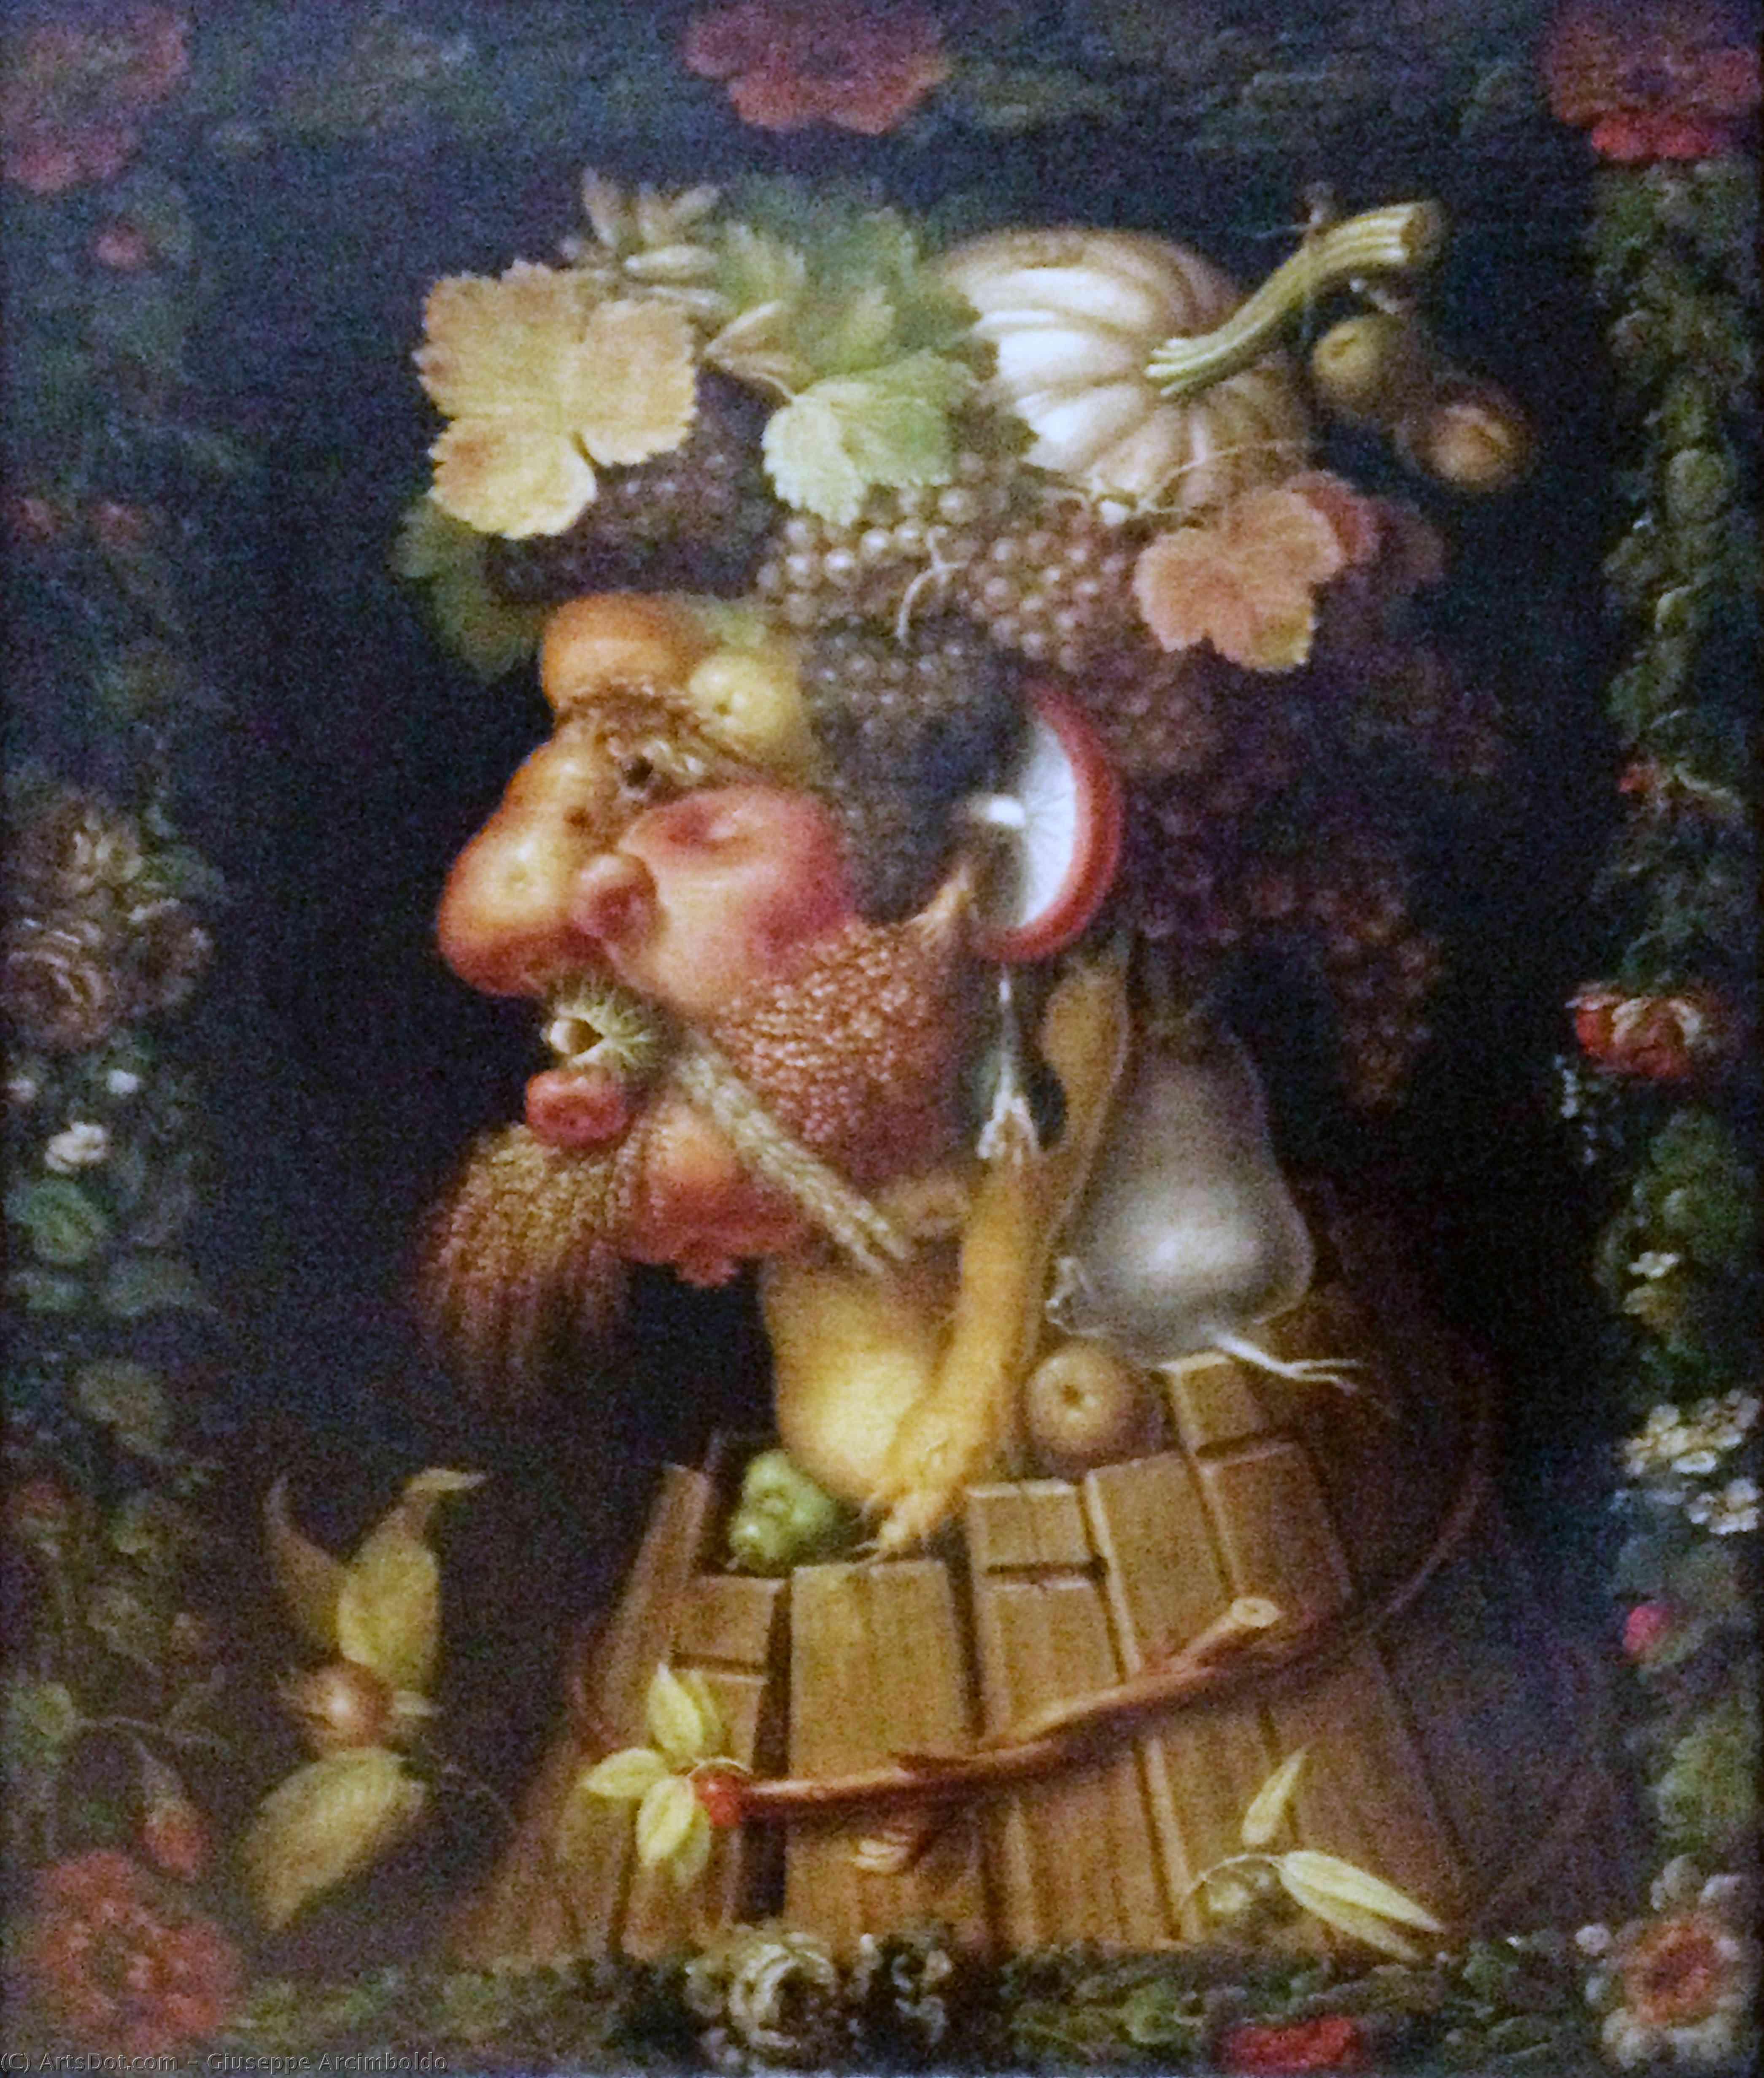 Wikioo.org - The Encyclopedia of Fine Arts - Painting, Artwork by Giuseppe Arcimboldo - Autumn